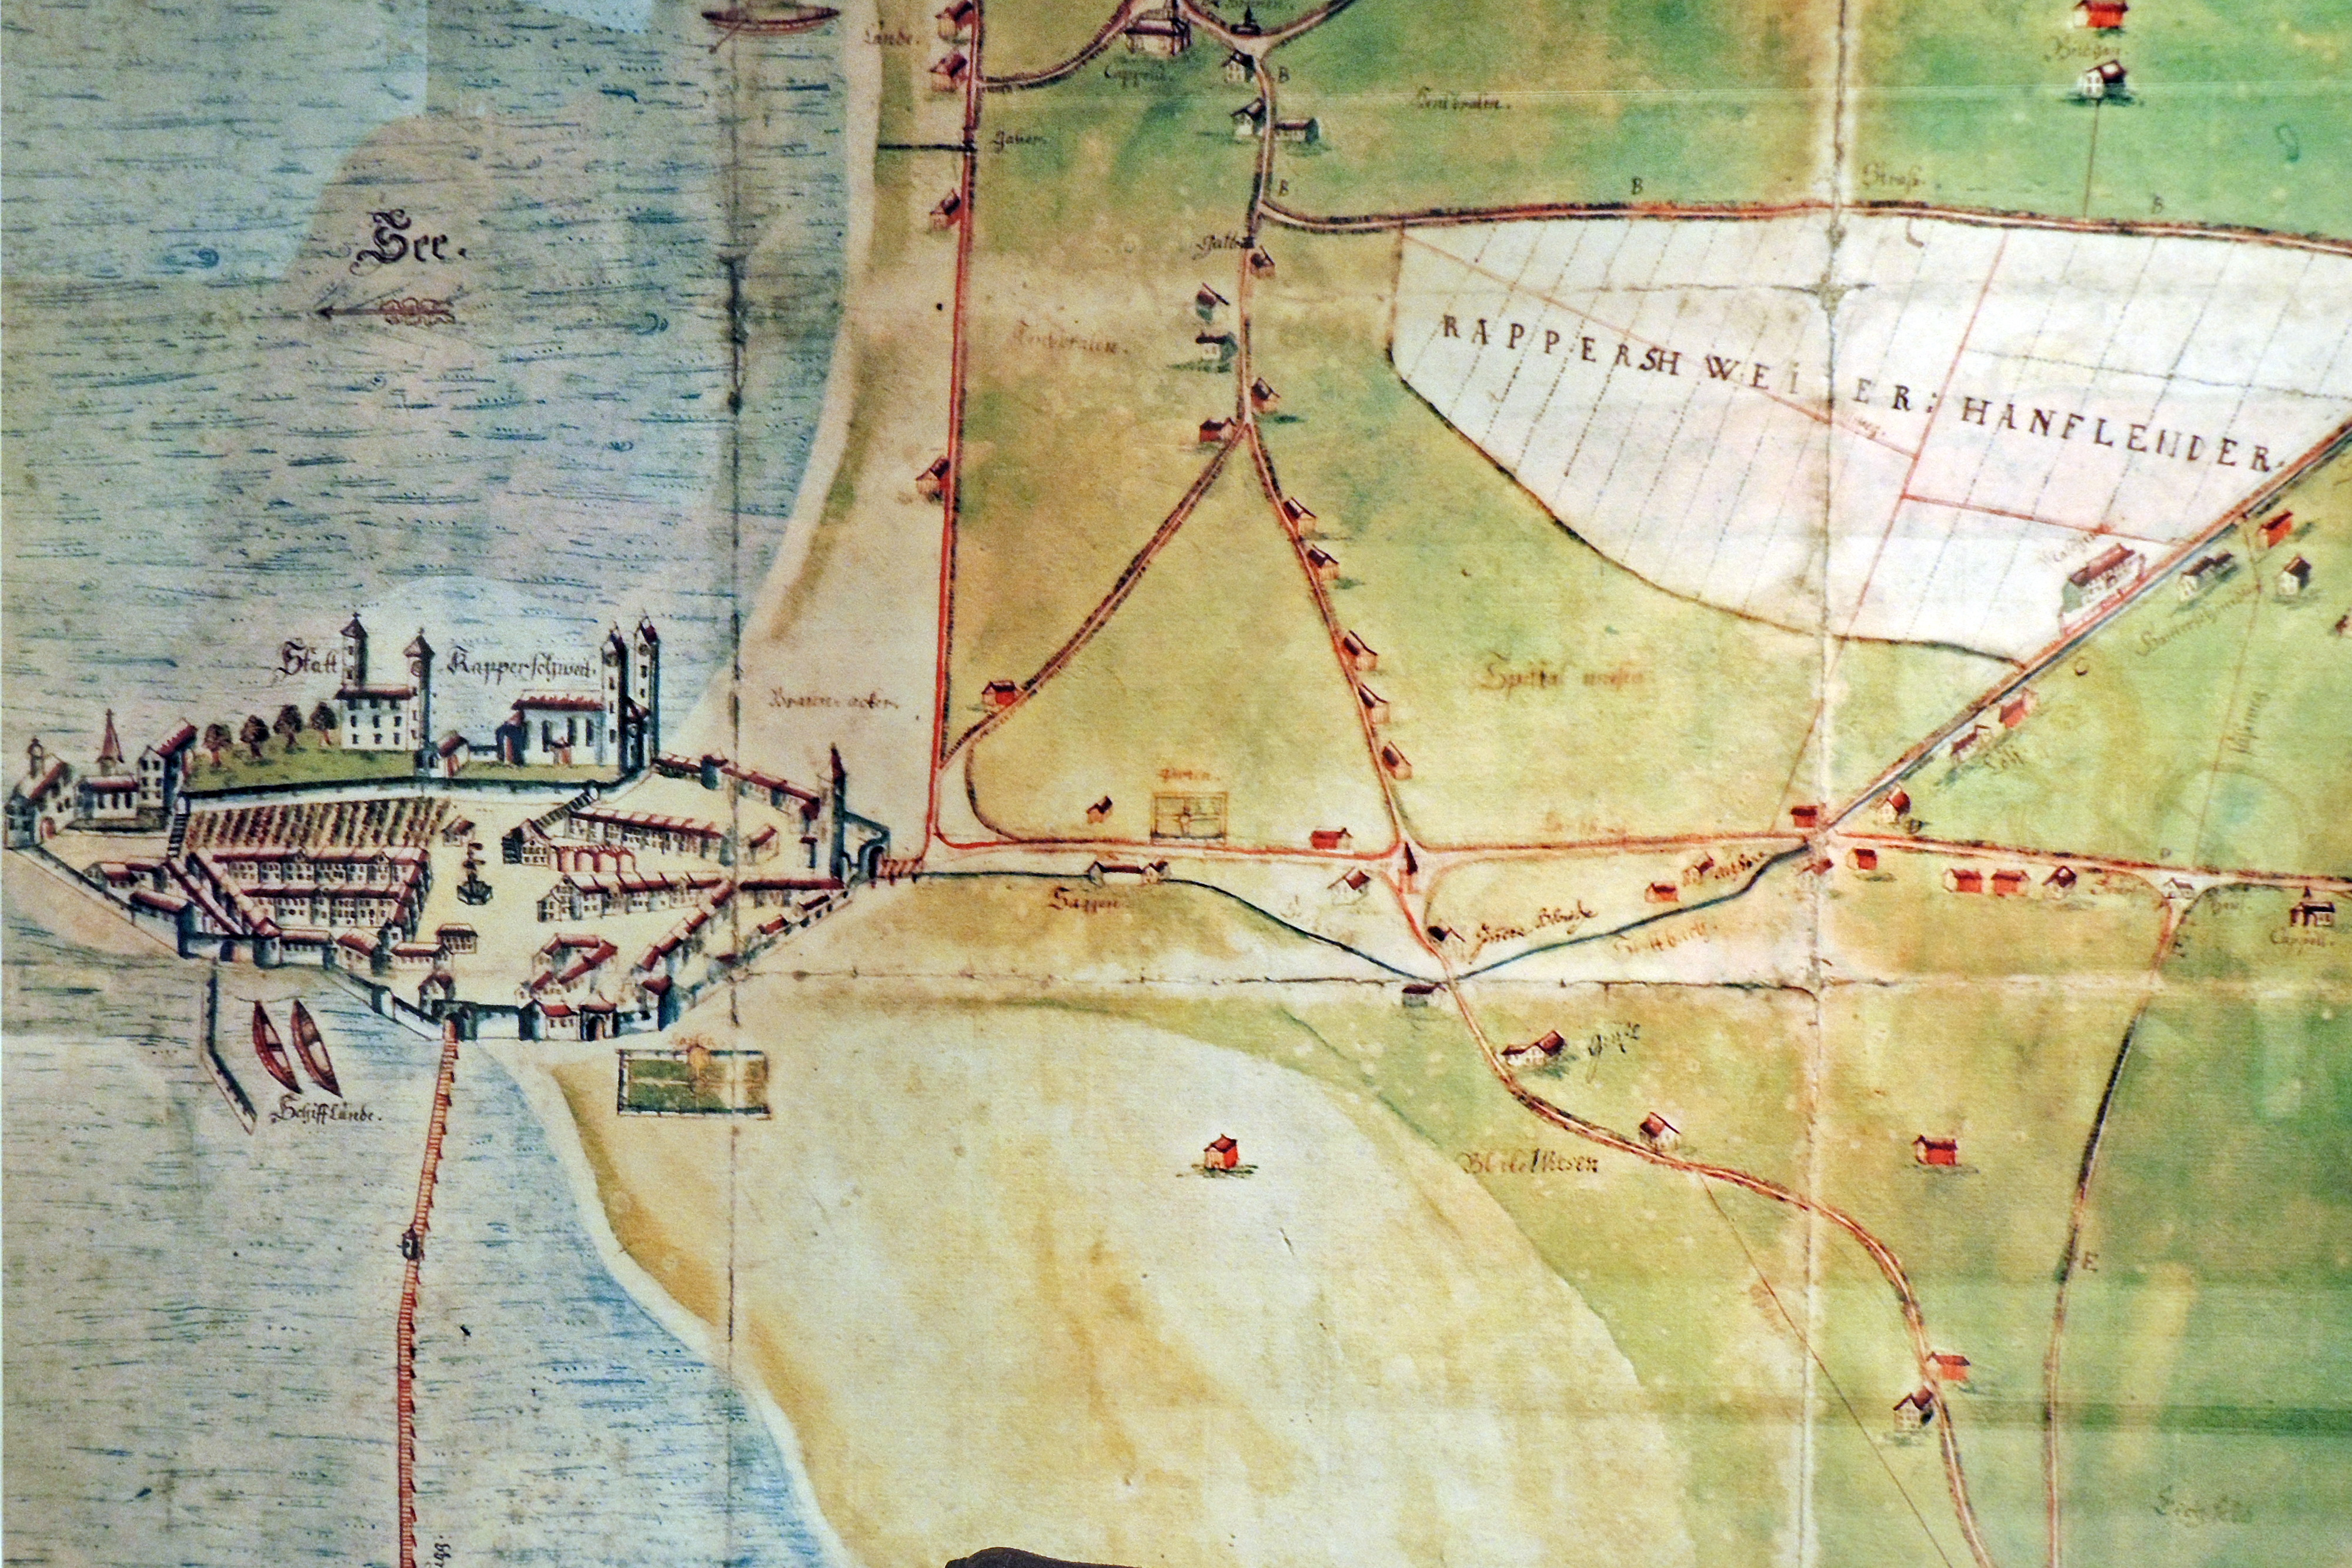 FileRapperswilJona Karte 1804jpg Wikimedia Commons